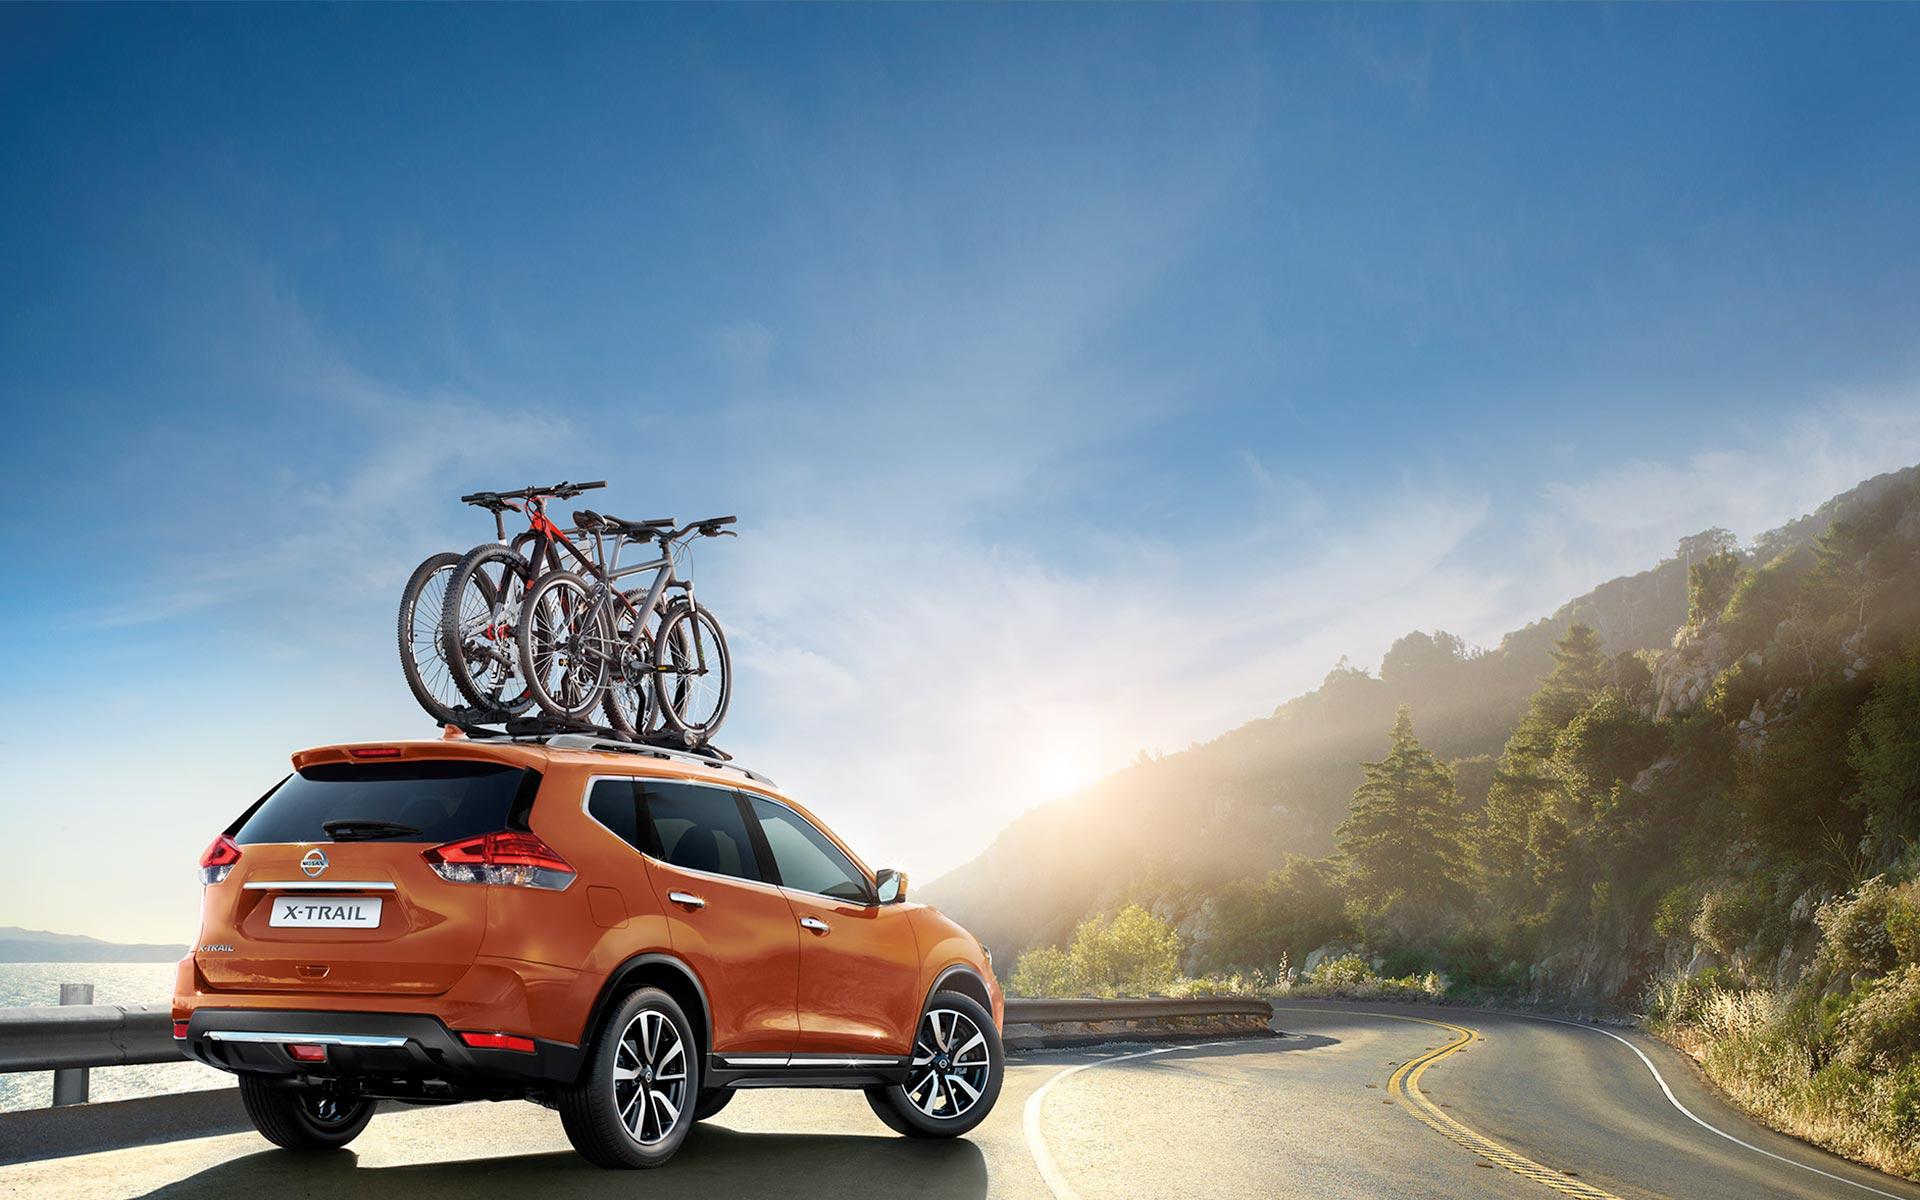 Nissan X-Trail SUV 7 places